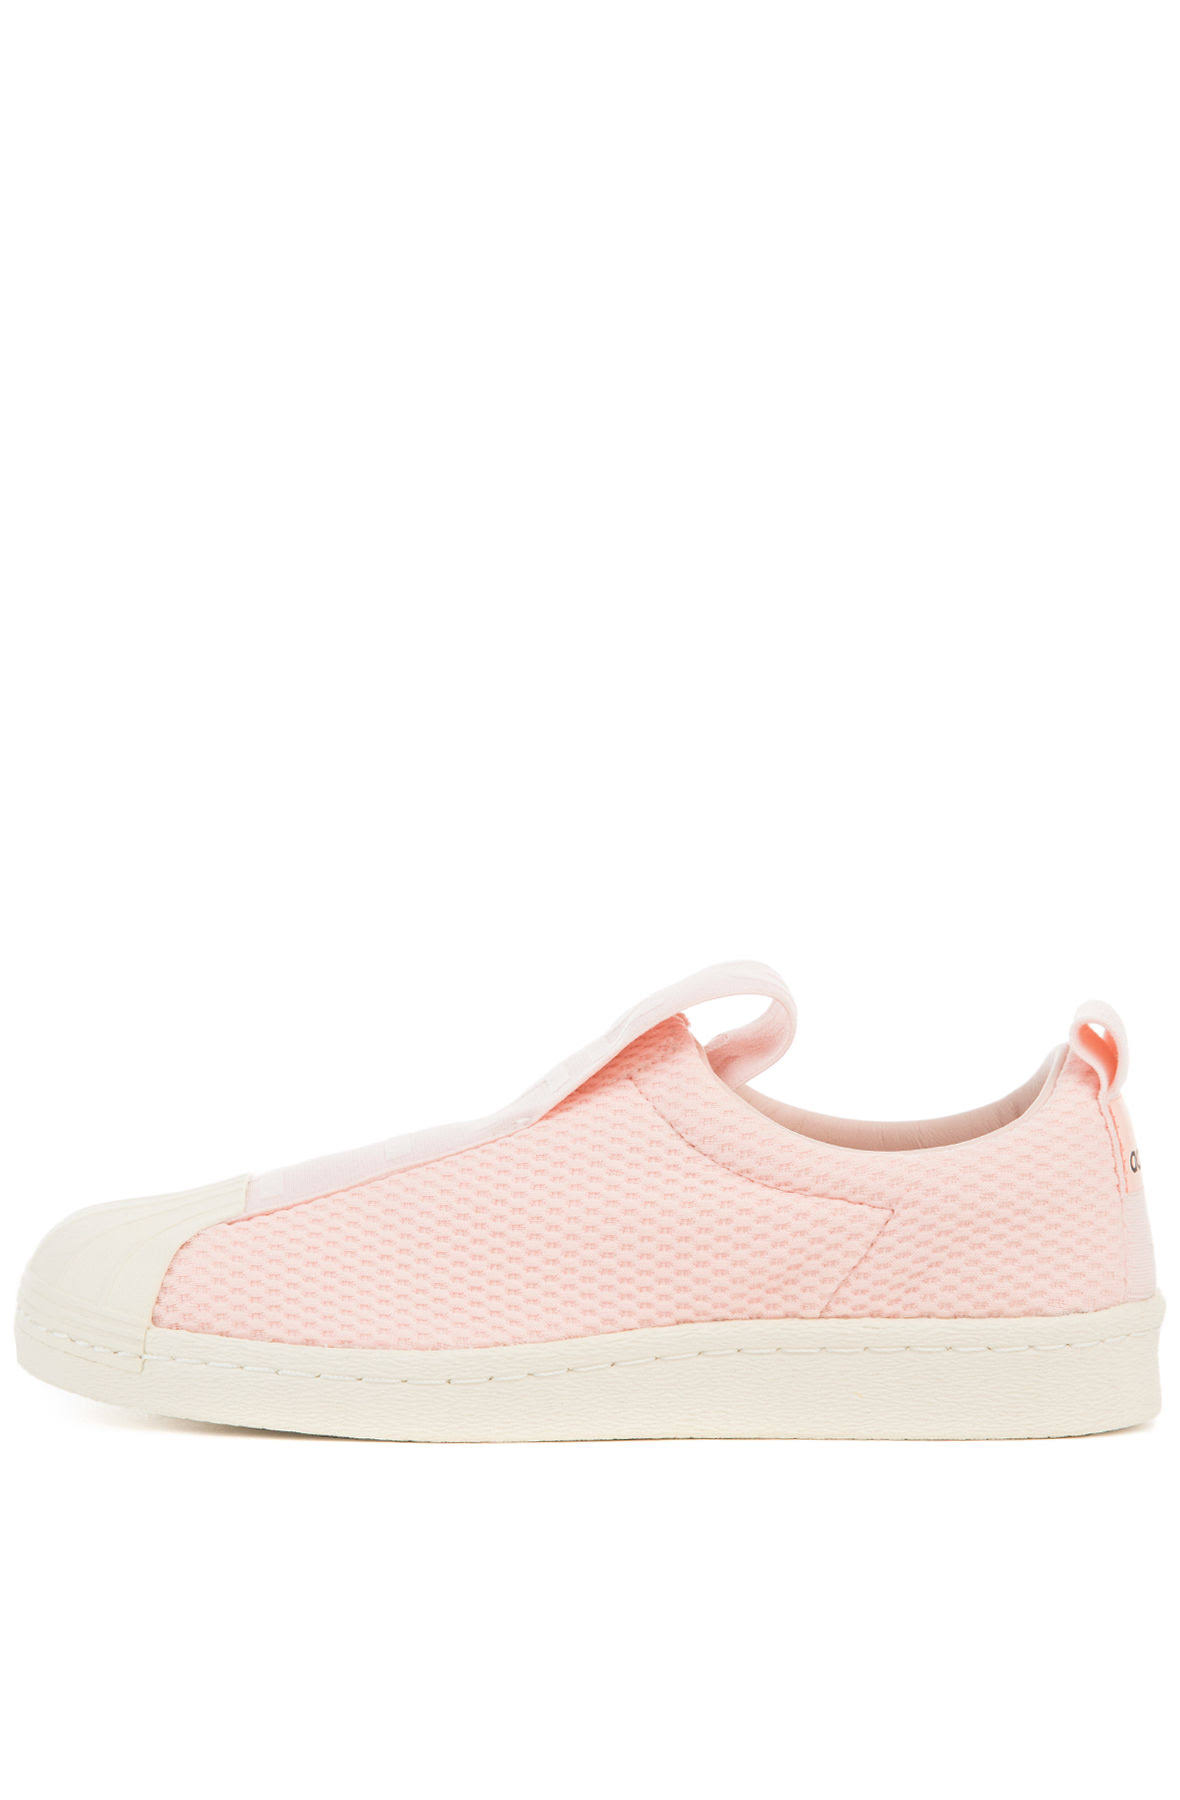 5 Superstar Women's Adidas Slipon Sneaker Bw35 0BPaZwqX